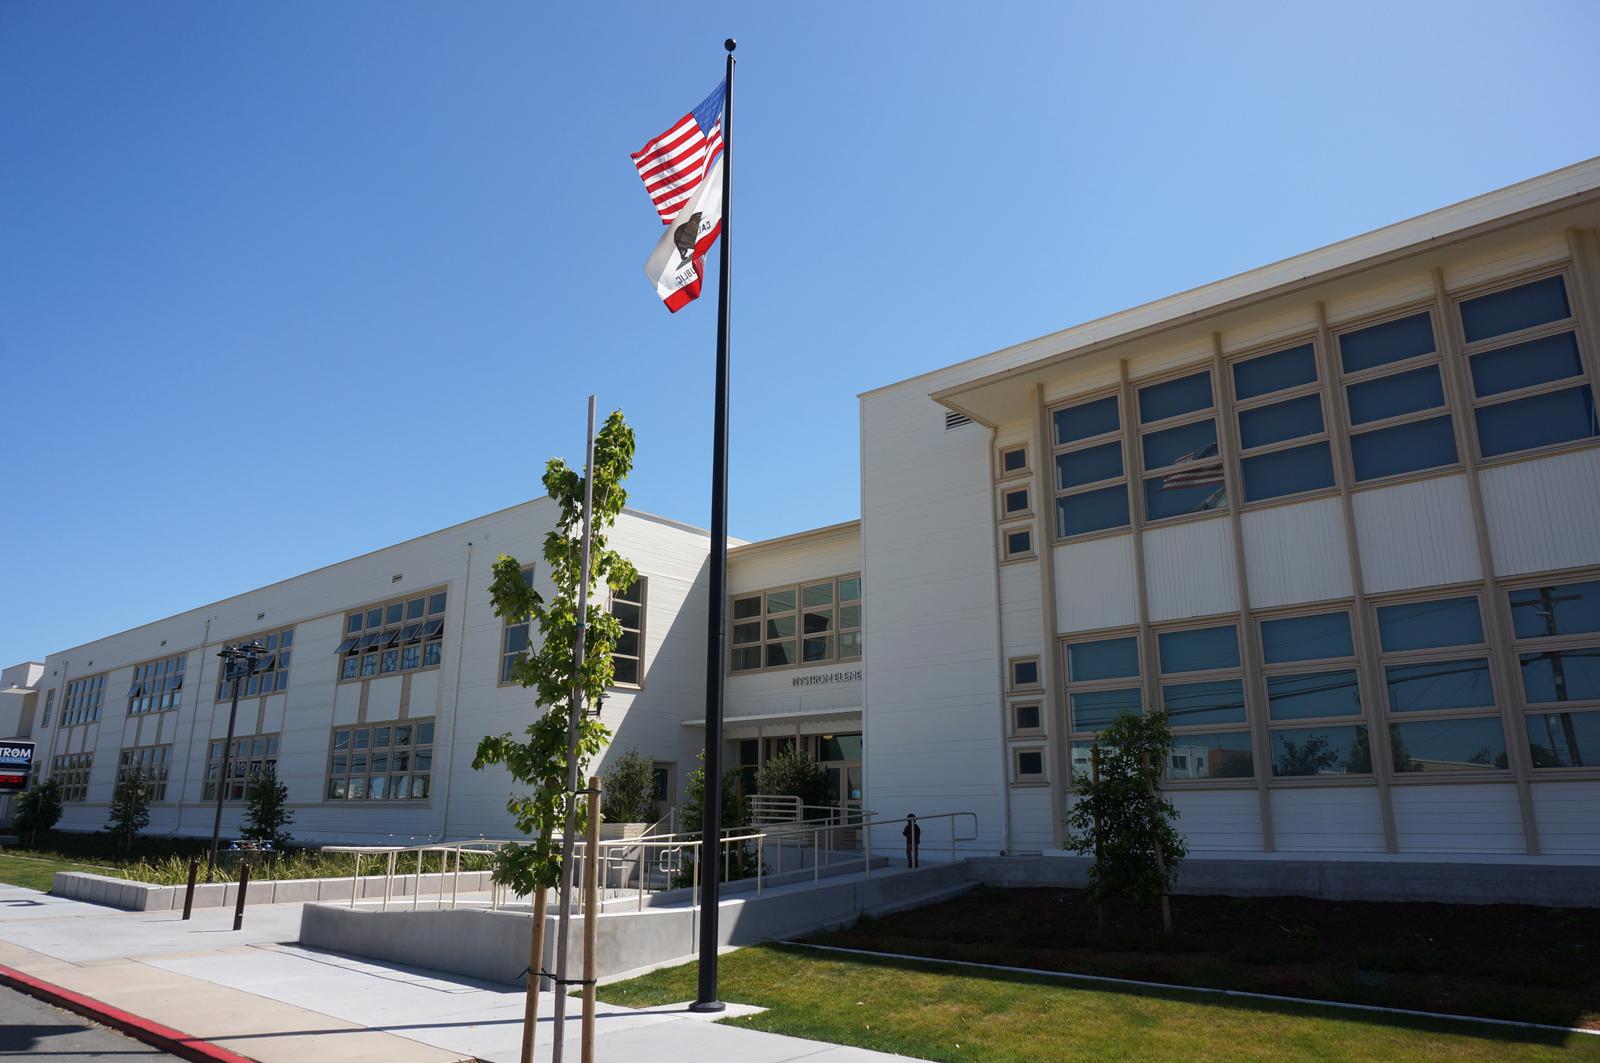 Nystrom Elementary School CC-ND